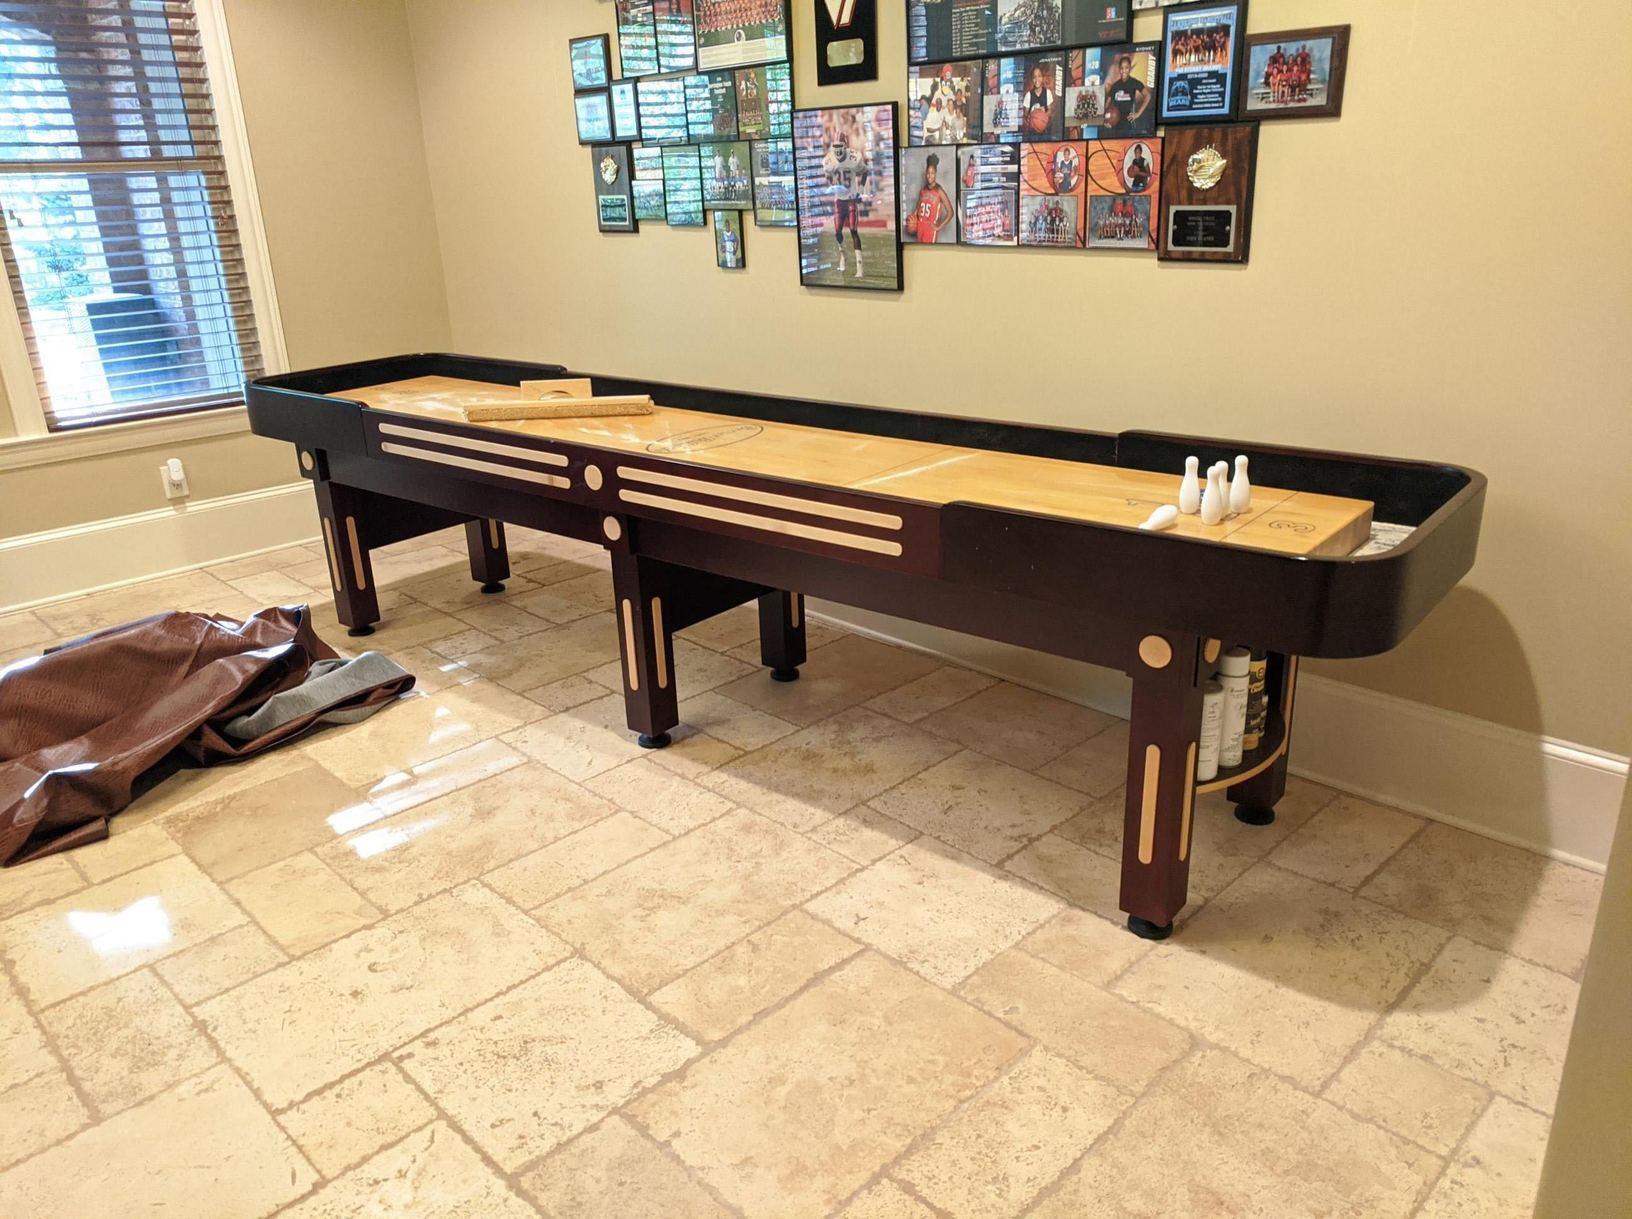 Shuffleboard Table Removal in Milton, GA - Before Photo